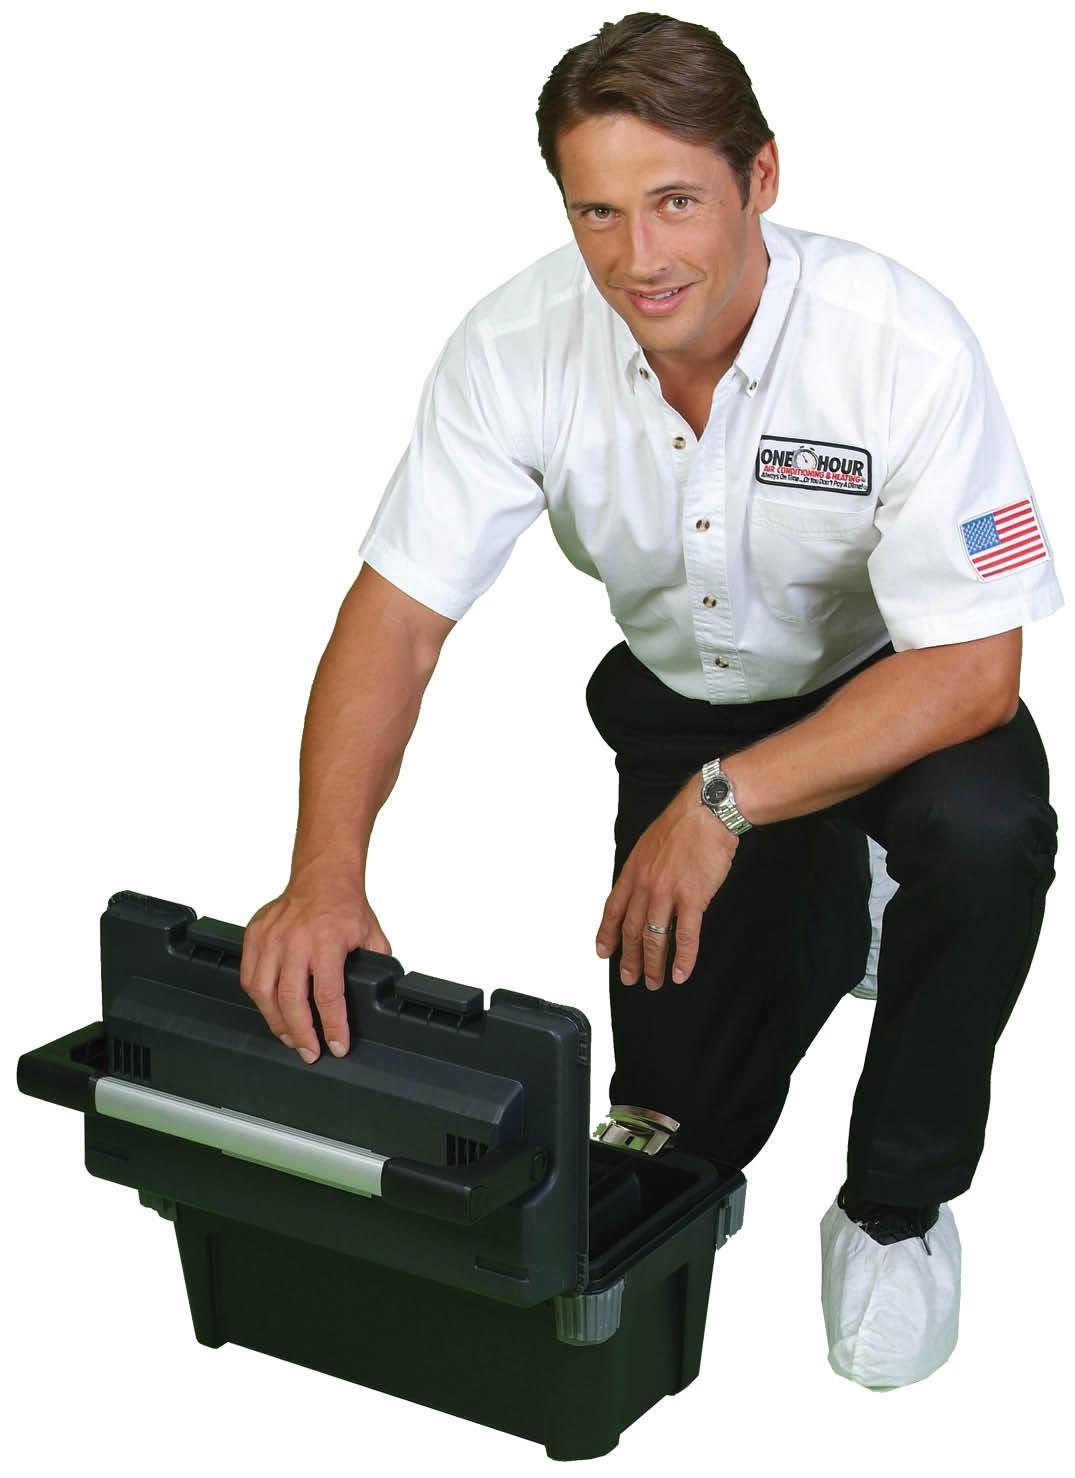 Las Vegas Heating And Ac Repair Coupons One Hour